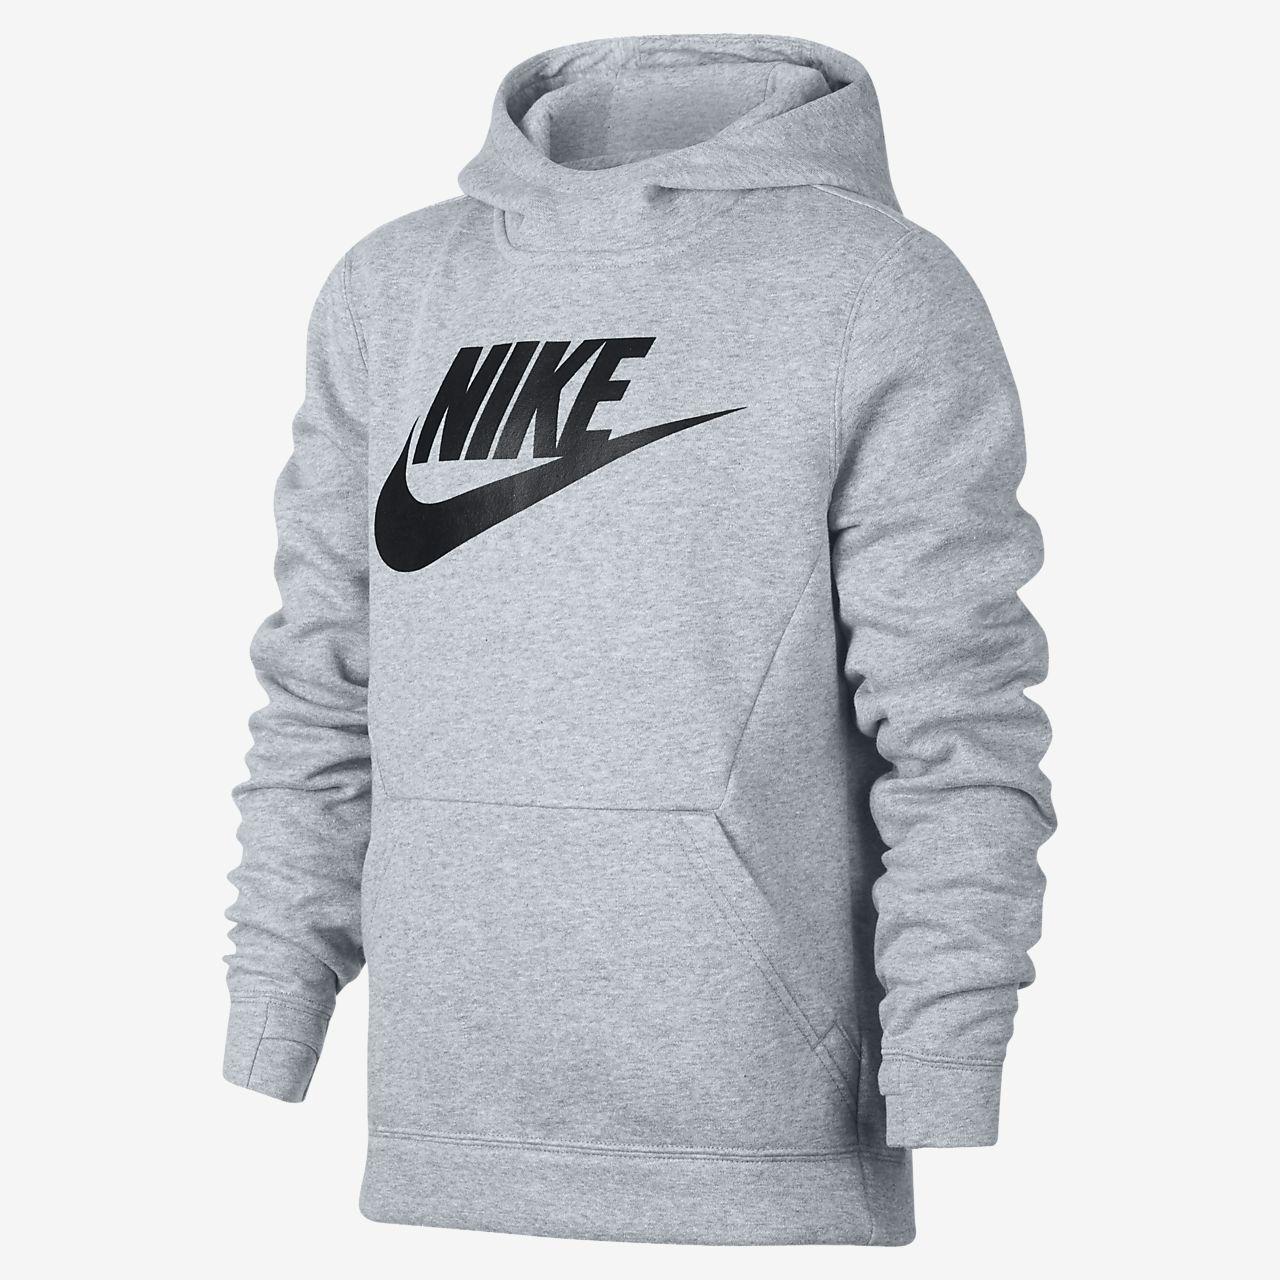 pretty nice 3112a 73ede Nike Sportswear. 49,90 €